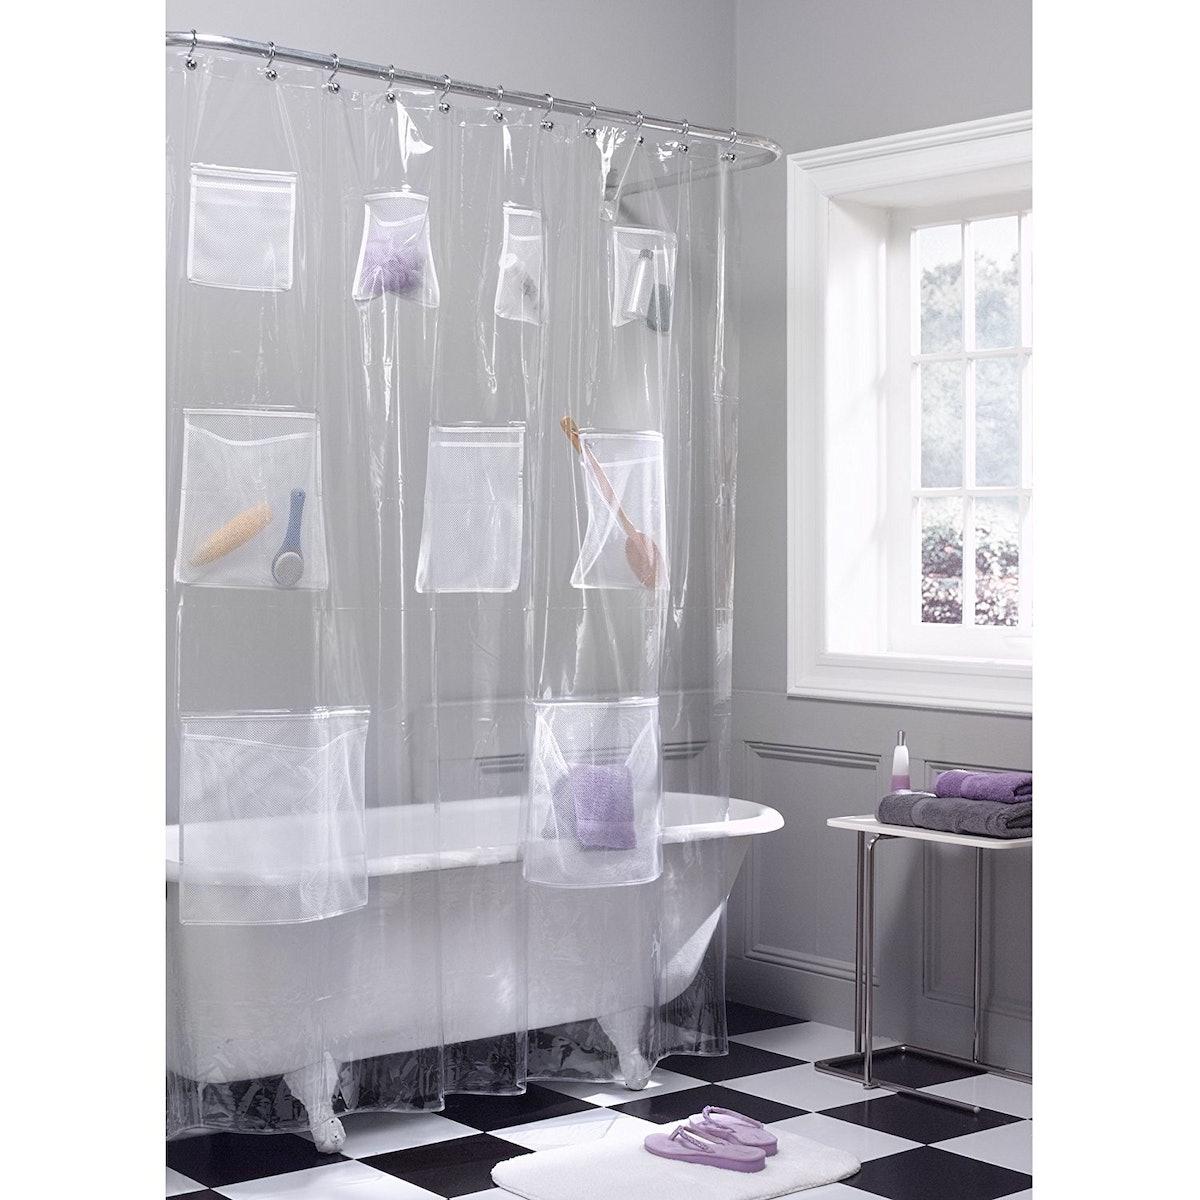 MAYTEX Quick-Dry Pocket Shower Curtain